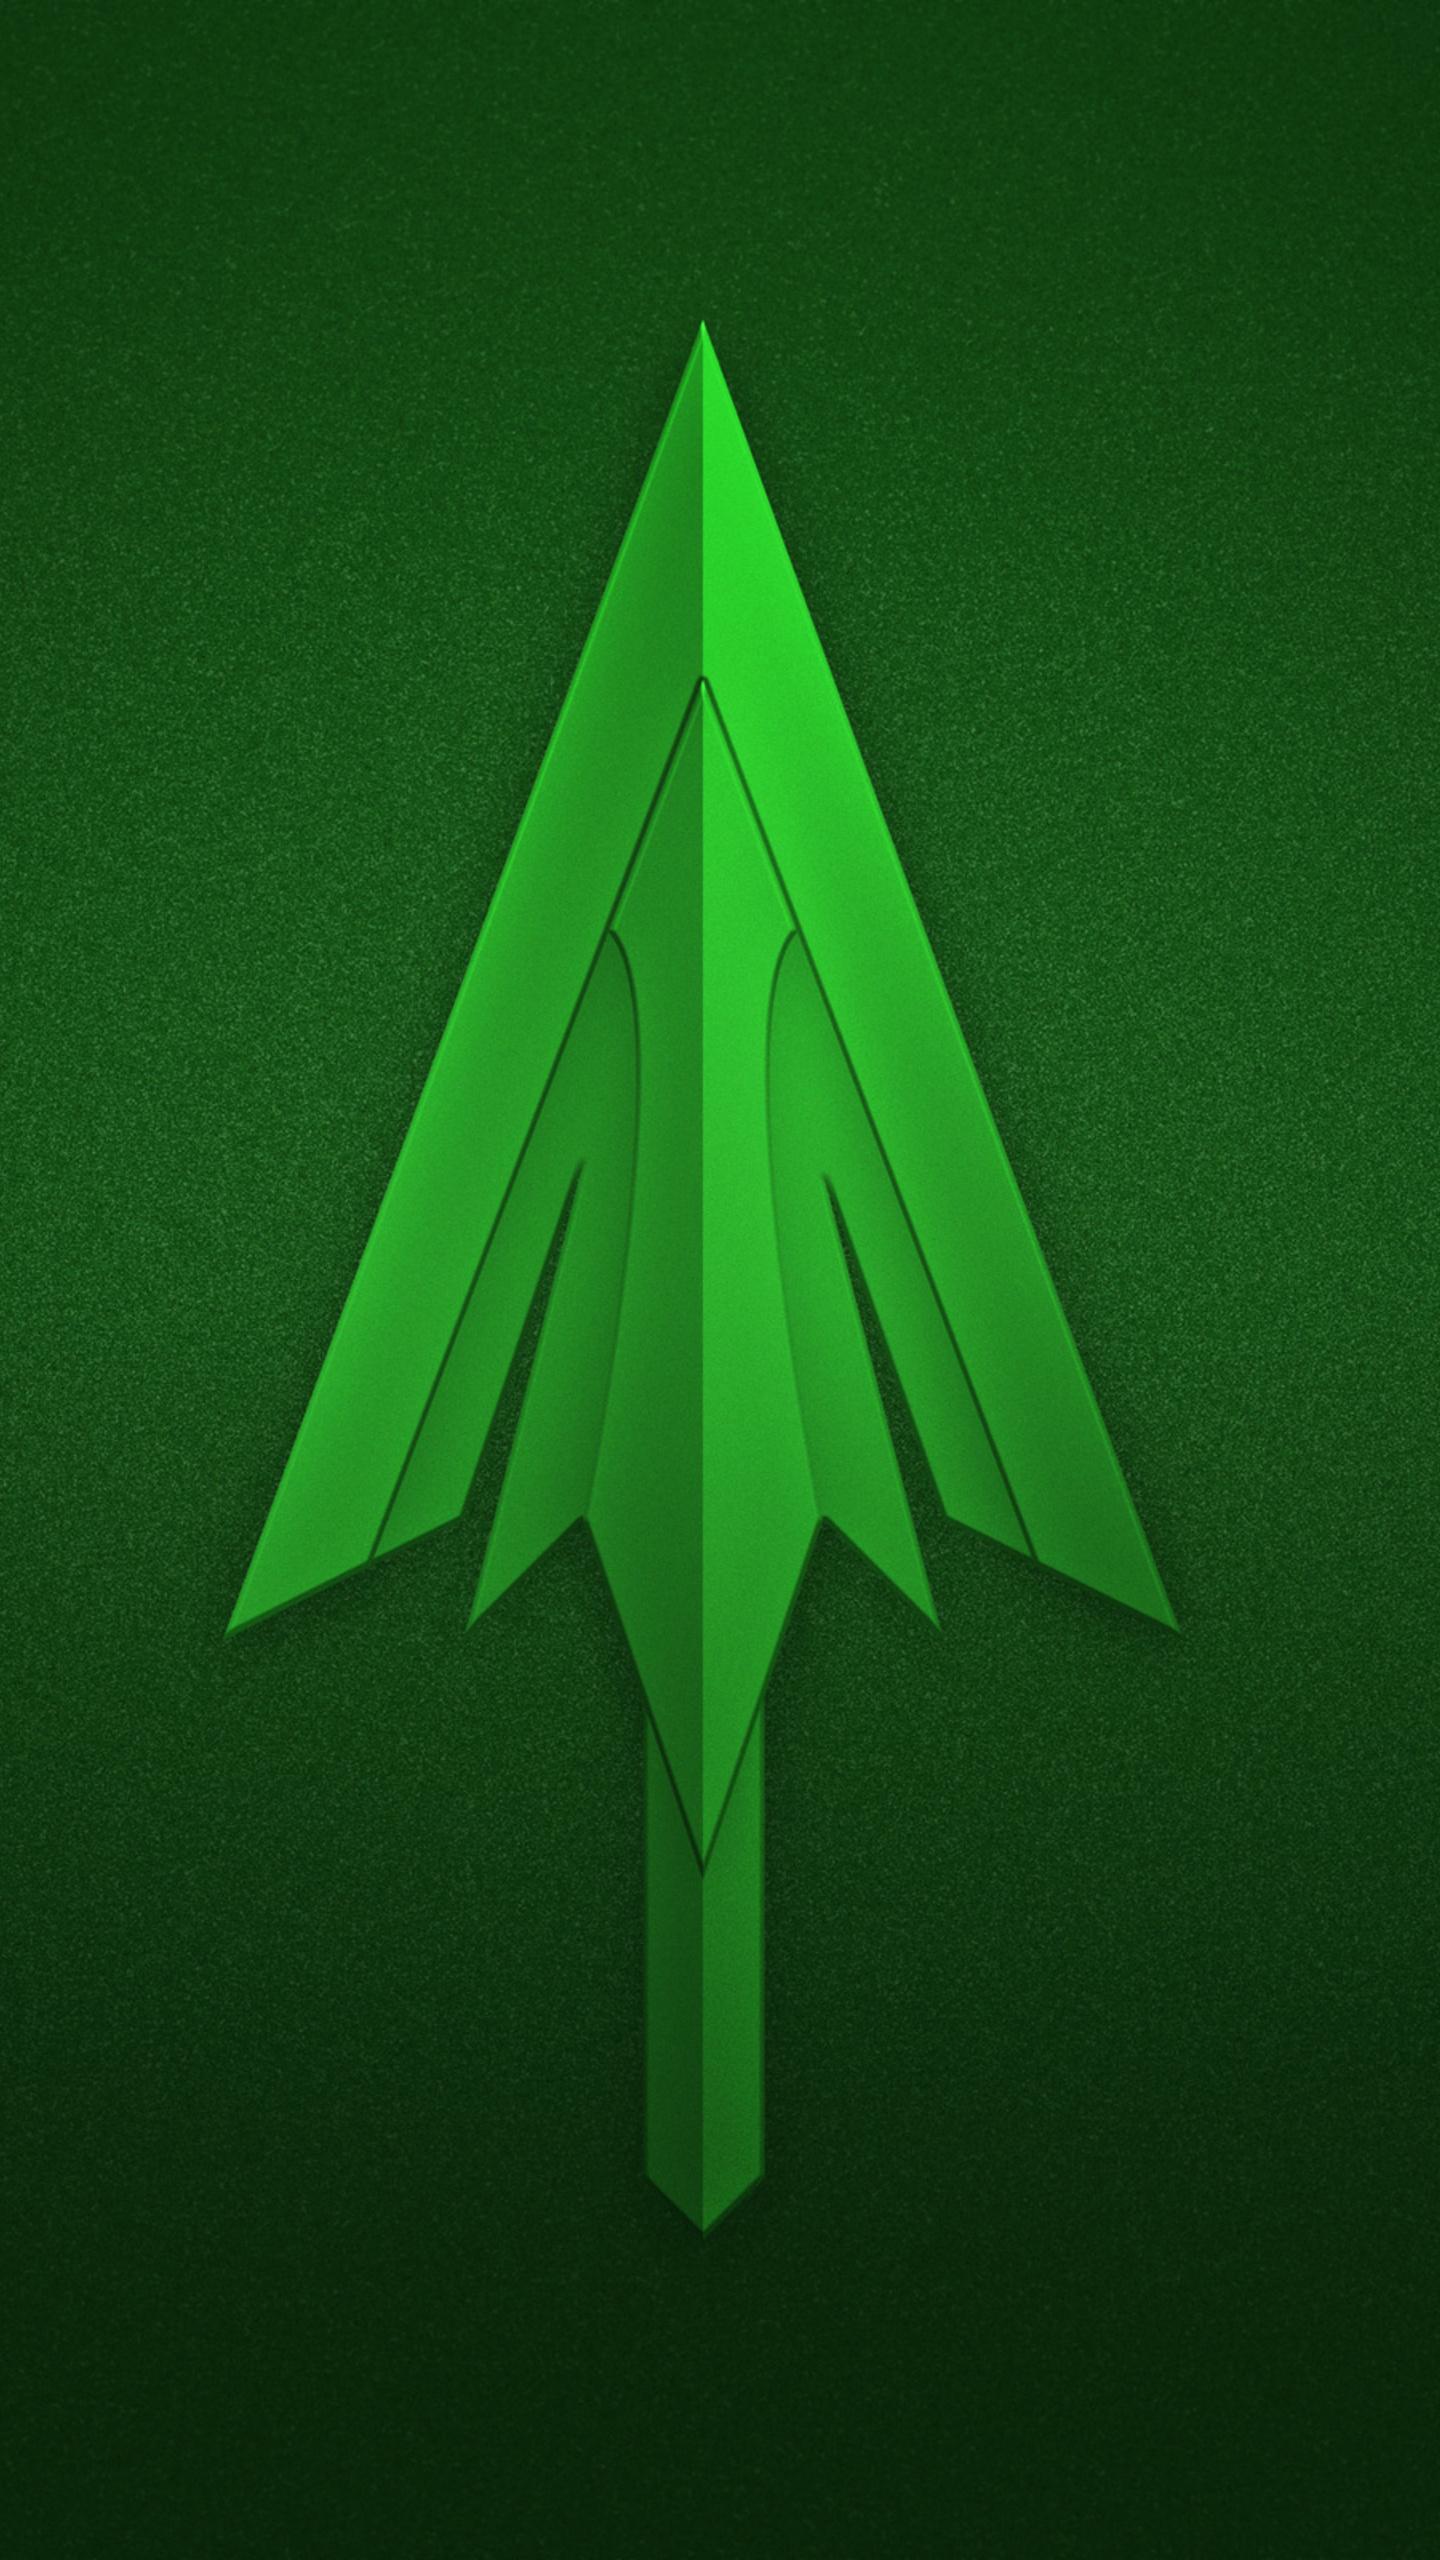 1440x2560 Green Arrow Logo Samsung Galaxy S6,S7 ,Google ...